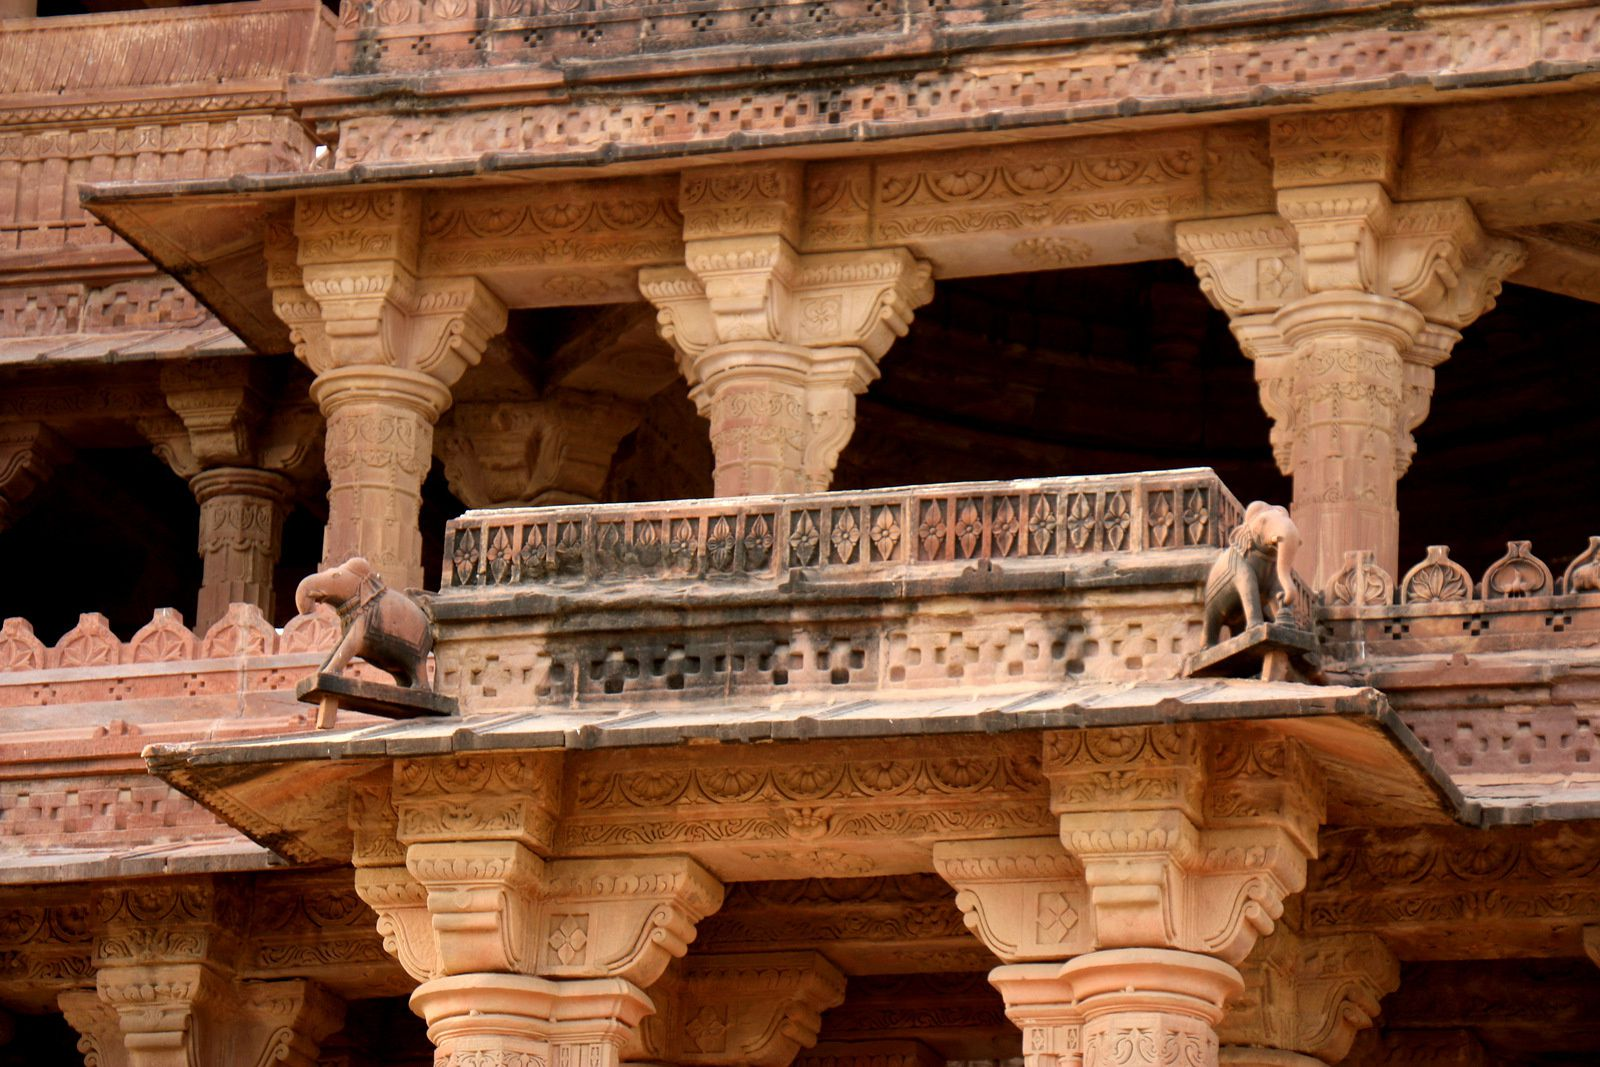 Cénotaphe du Maharaja Jaswant Singh , Mandore (Etat indien du Rajasthan)